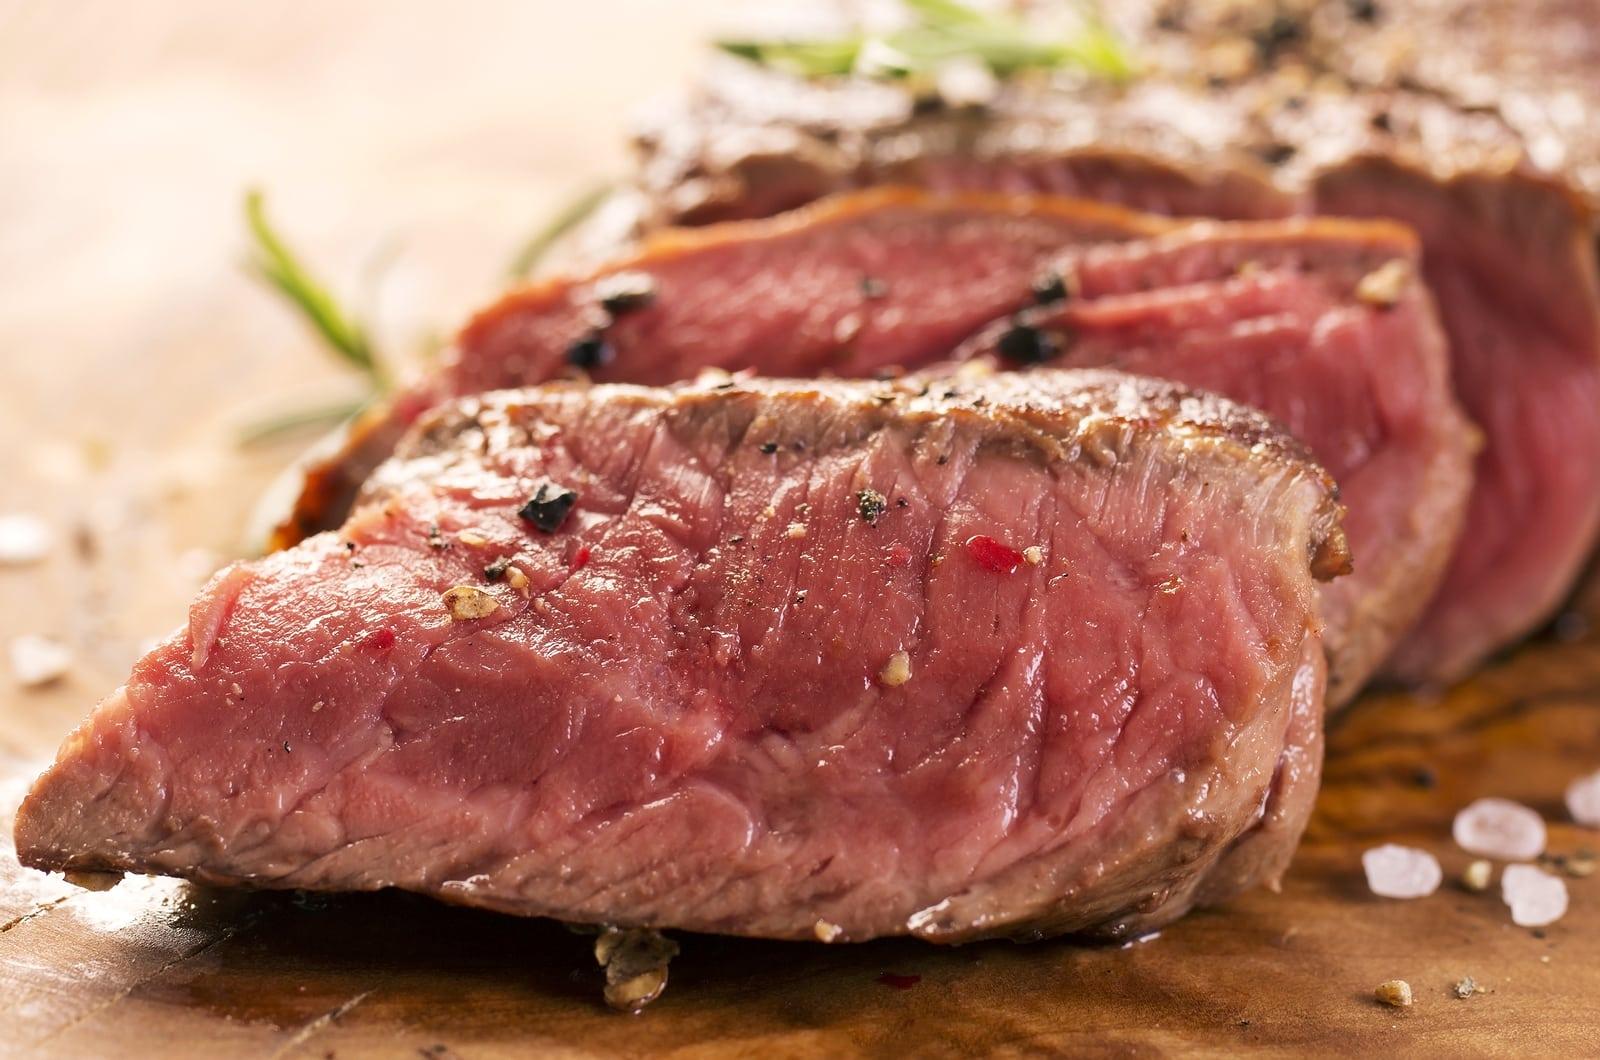 Carnes magras | Alimentos para diabeticos